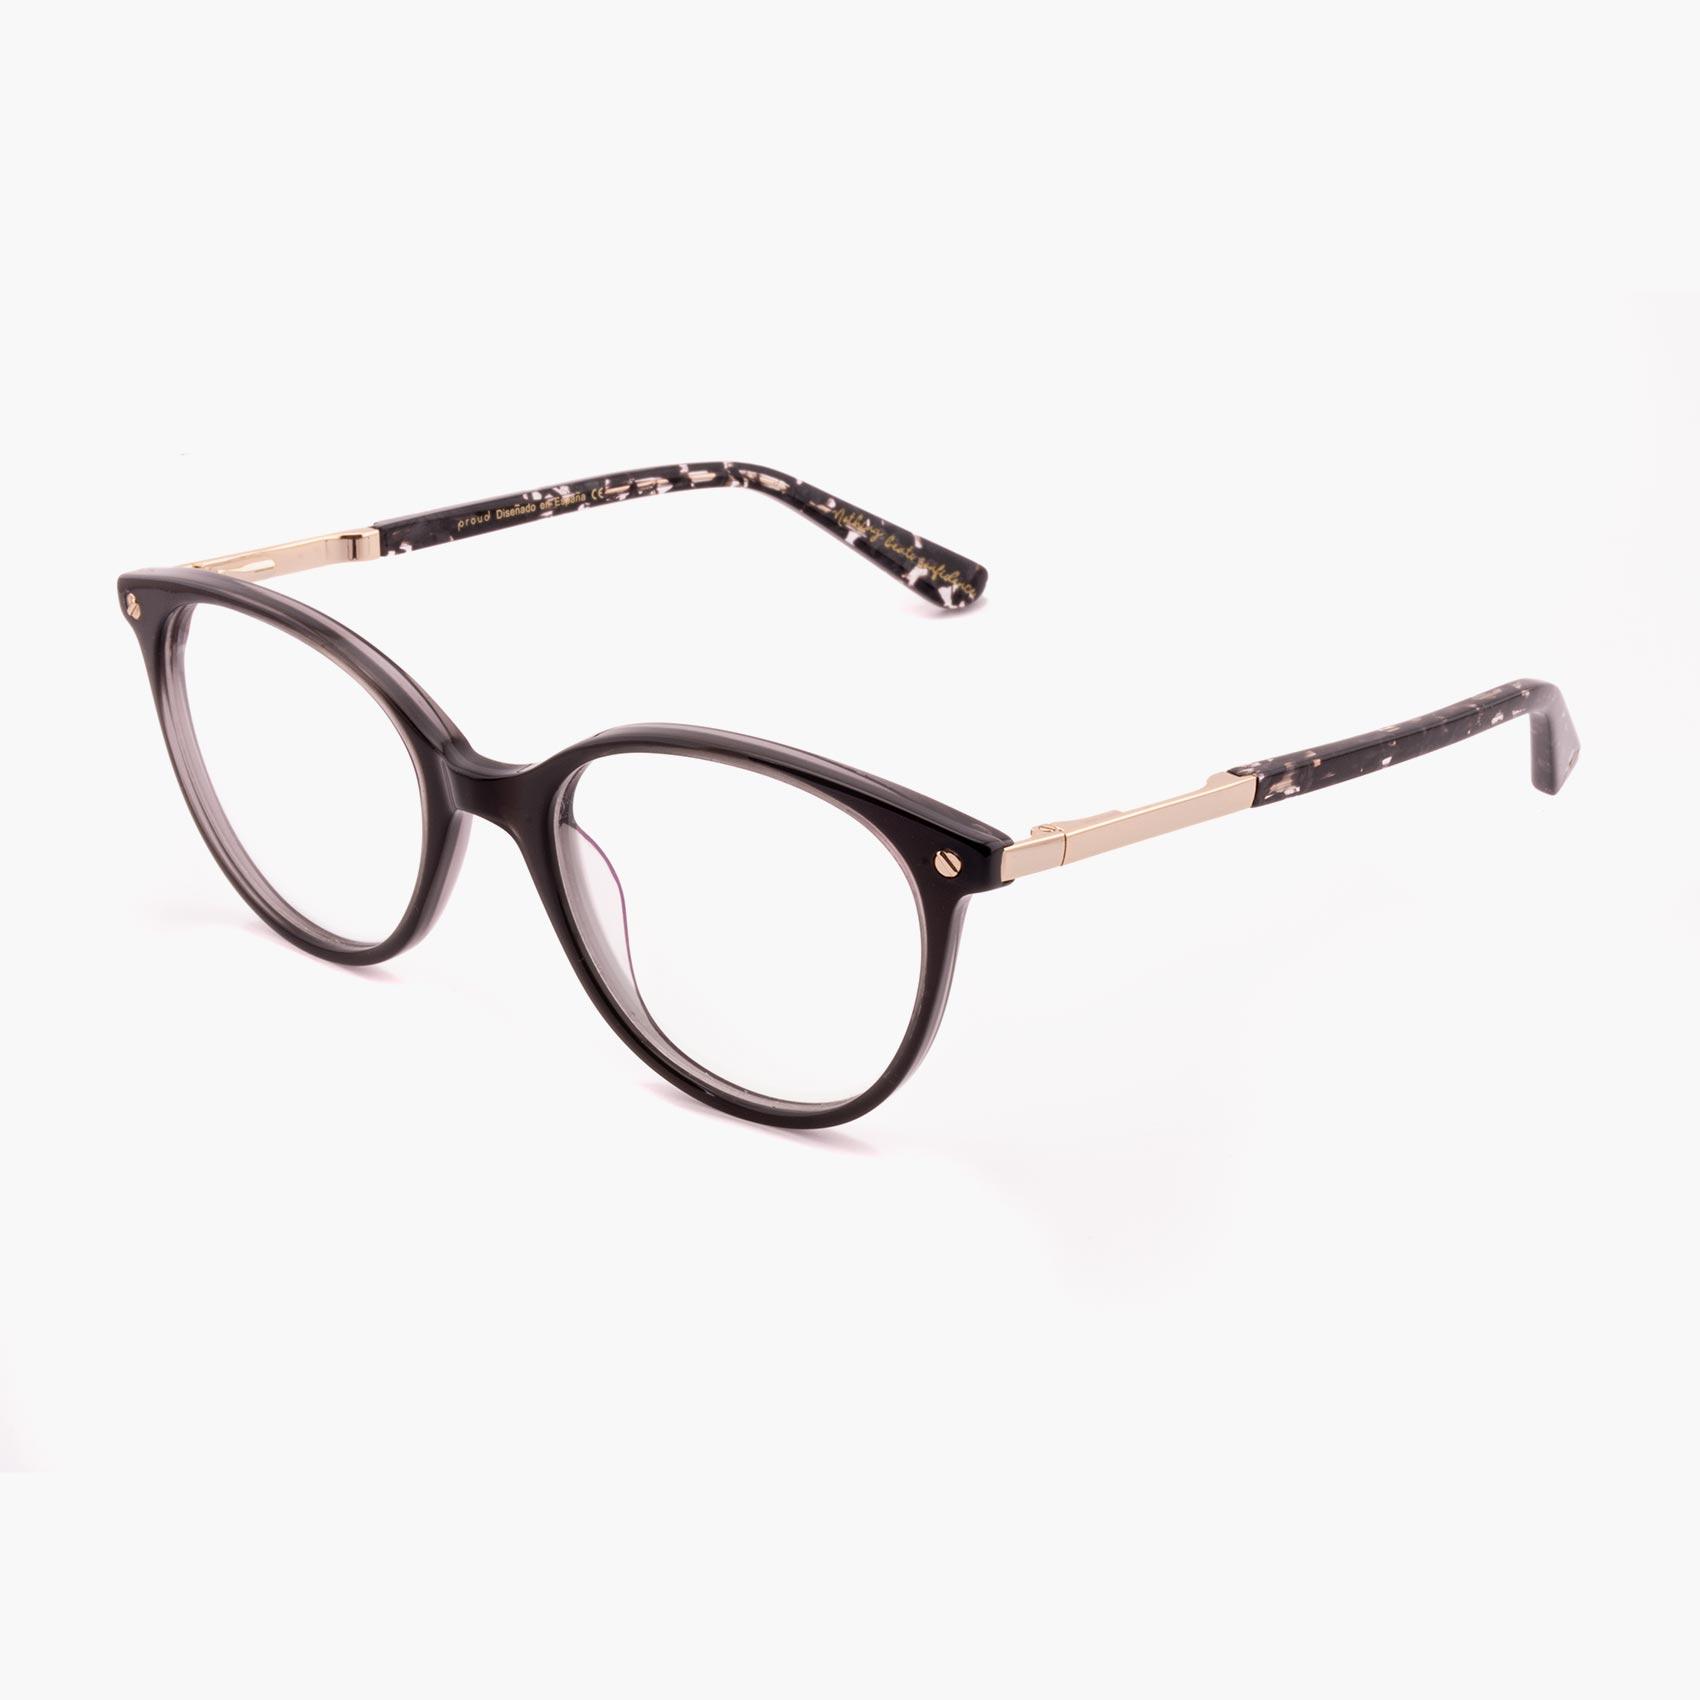 Proud eyewear Charlize C3 P gafas de vista mujer responsables